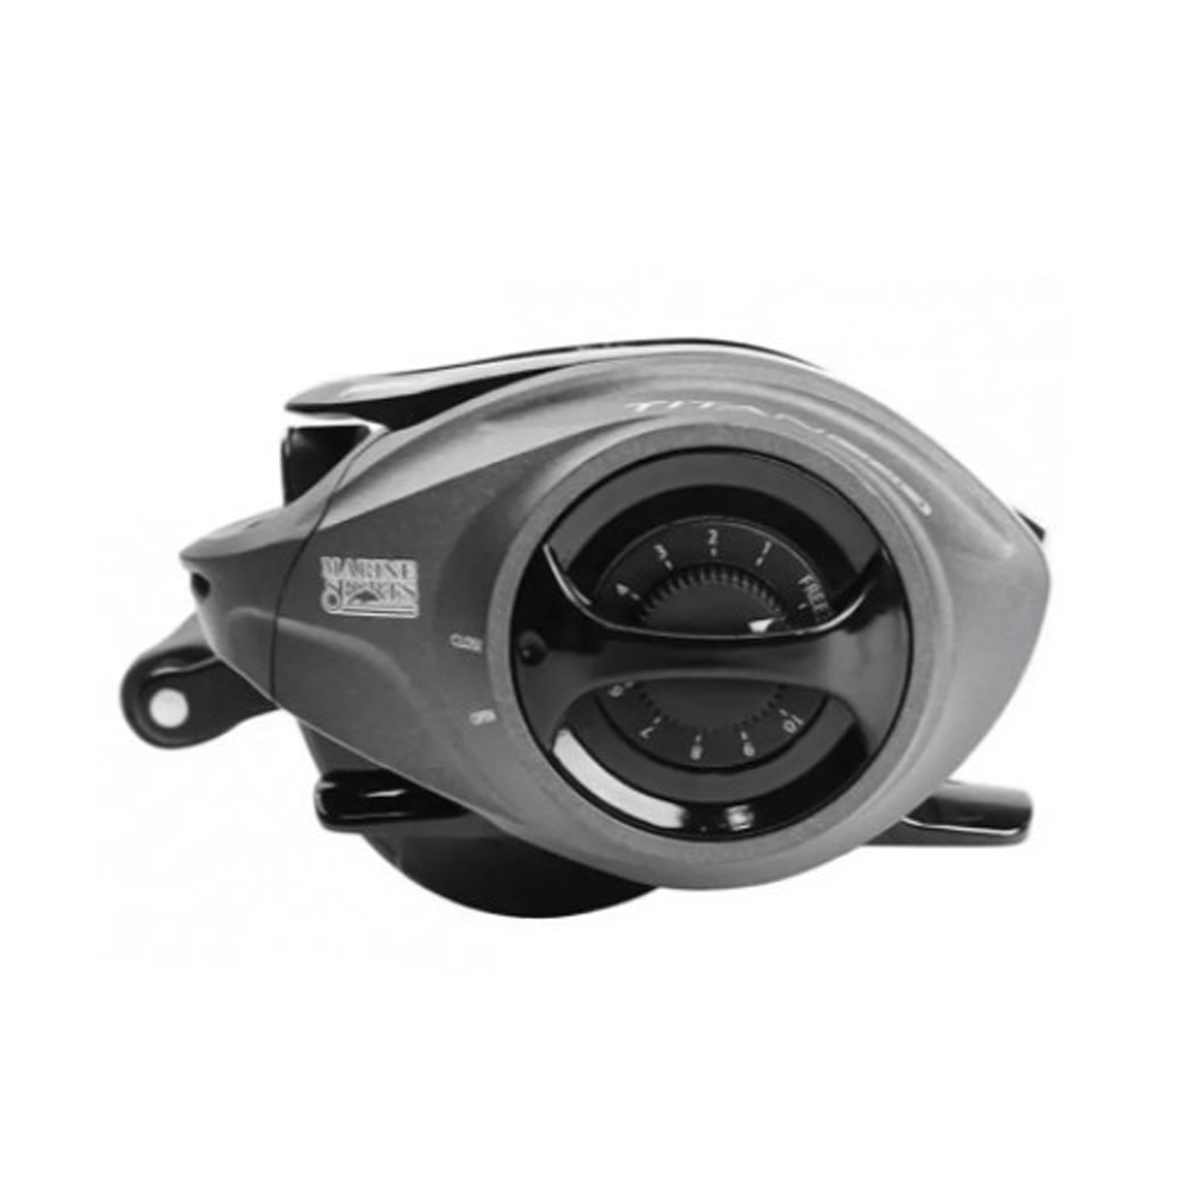 Carretilha Marine Sports Titan Pro 6000 (Direita)  - Pró Pesca Shop